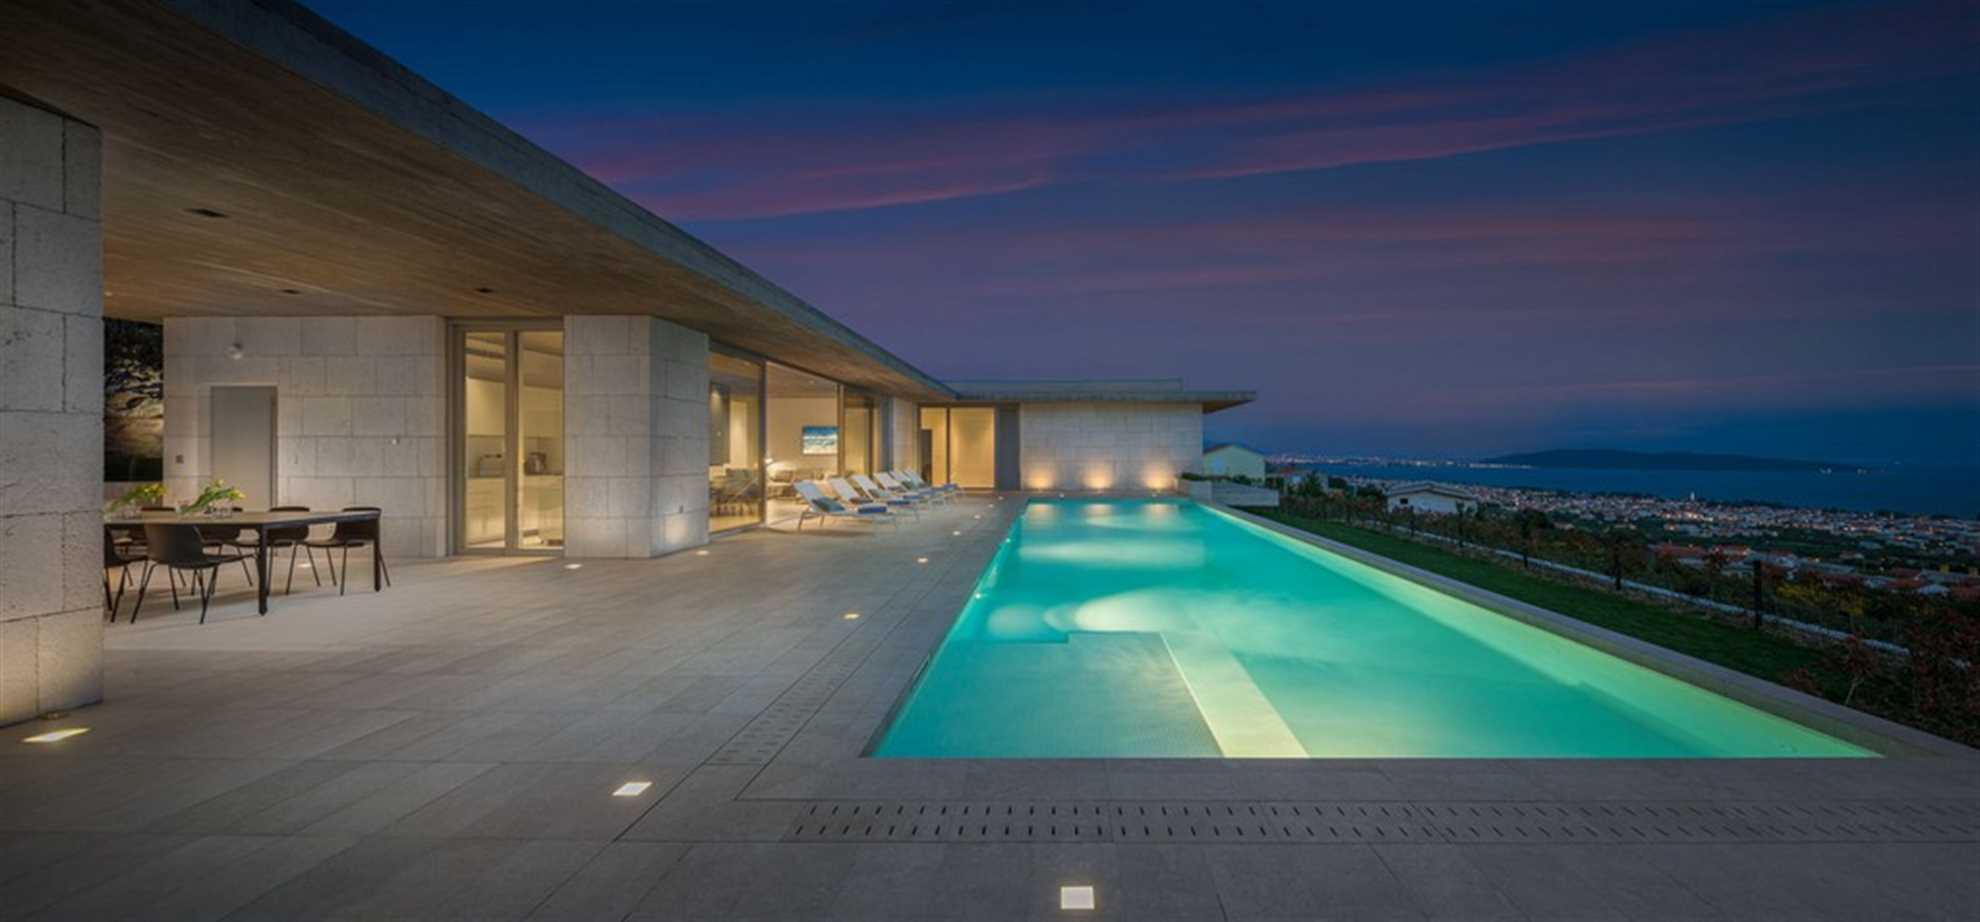 Radun Home near Split